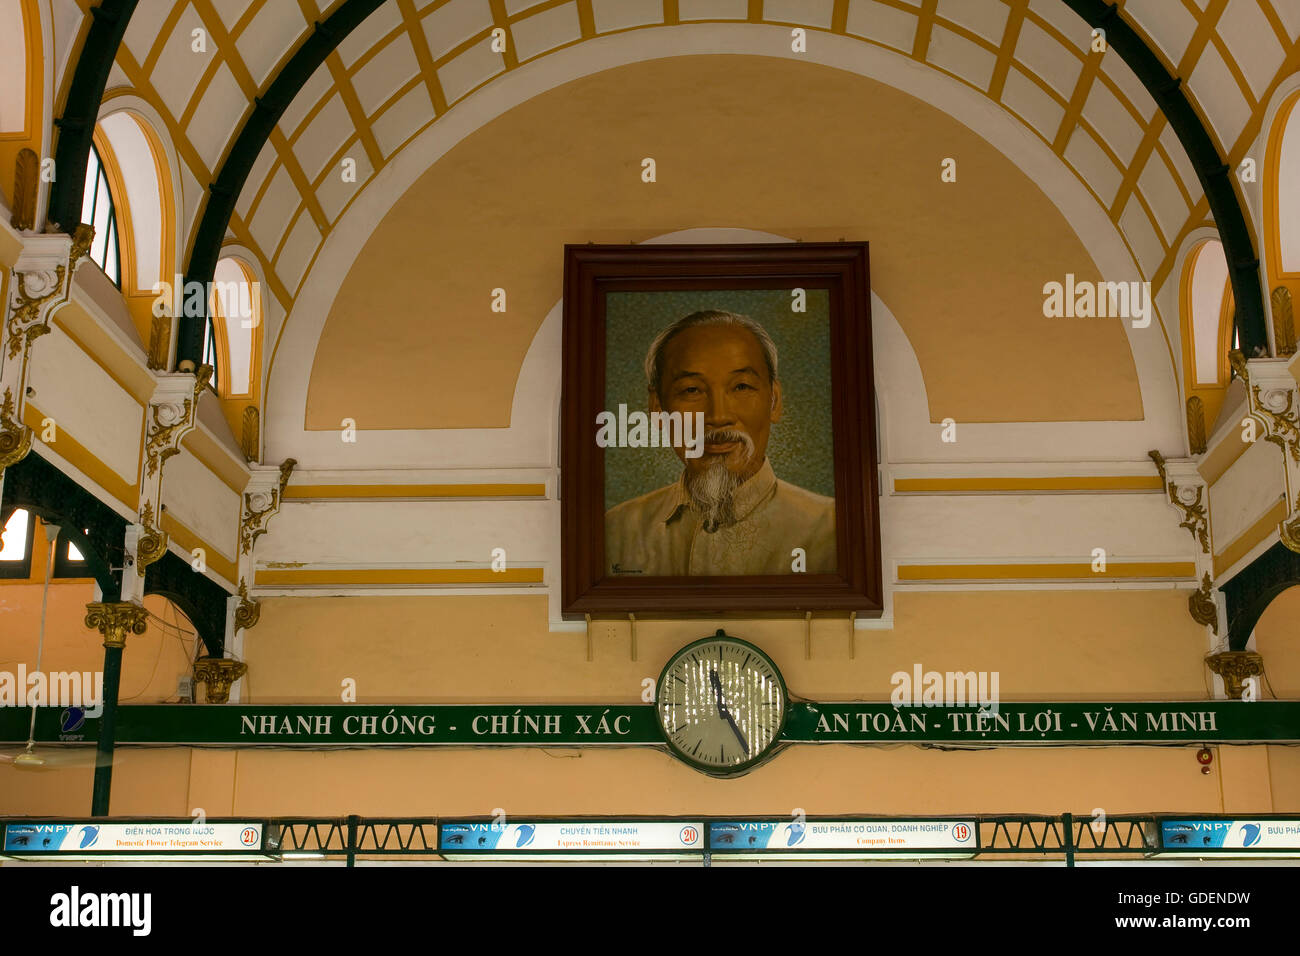 Main postoffice, Ho Chi Minh City, Vietnam / Saigon - Stock Image